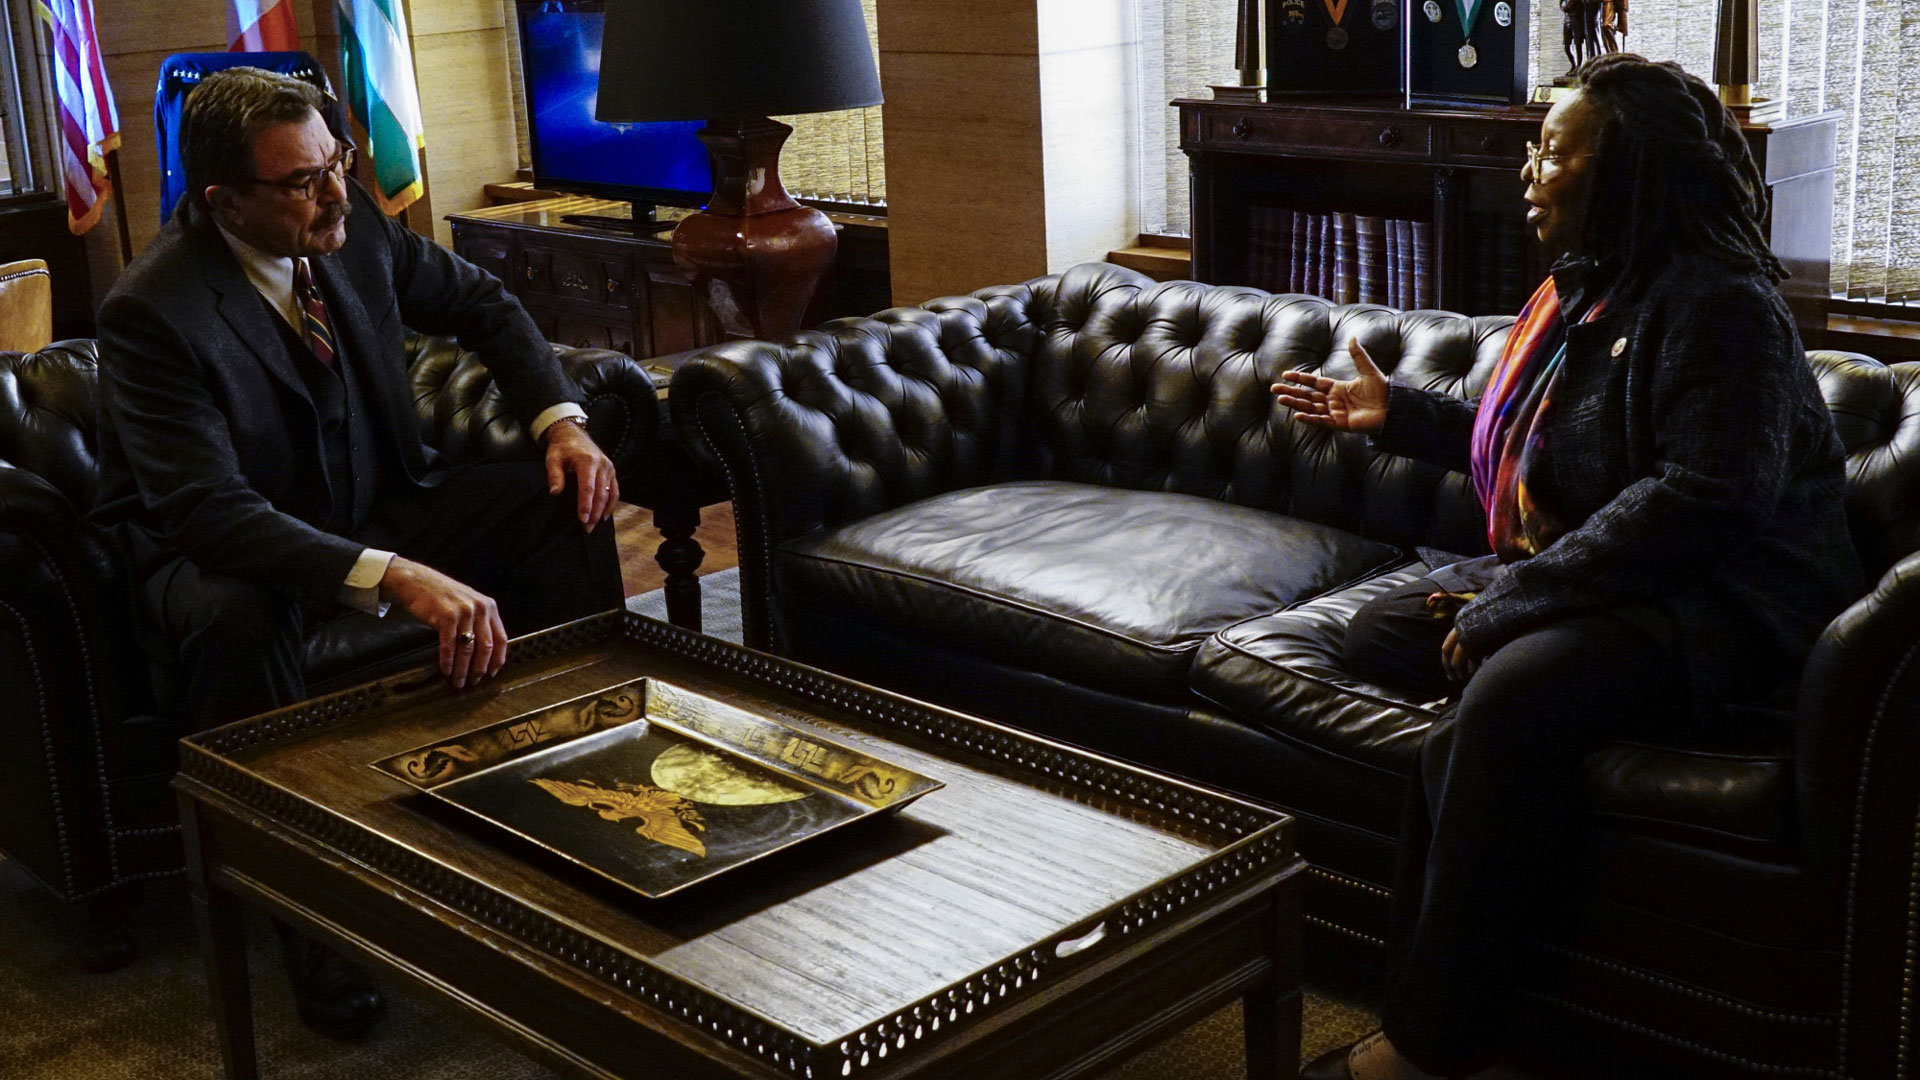 Tom Selleck as Frank Reagan and Whoopi Goldberg as City Council Speaker Regina Thomas